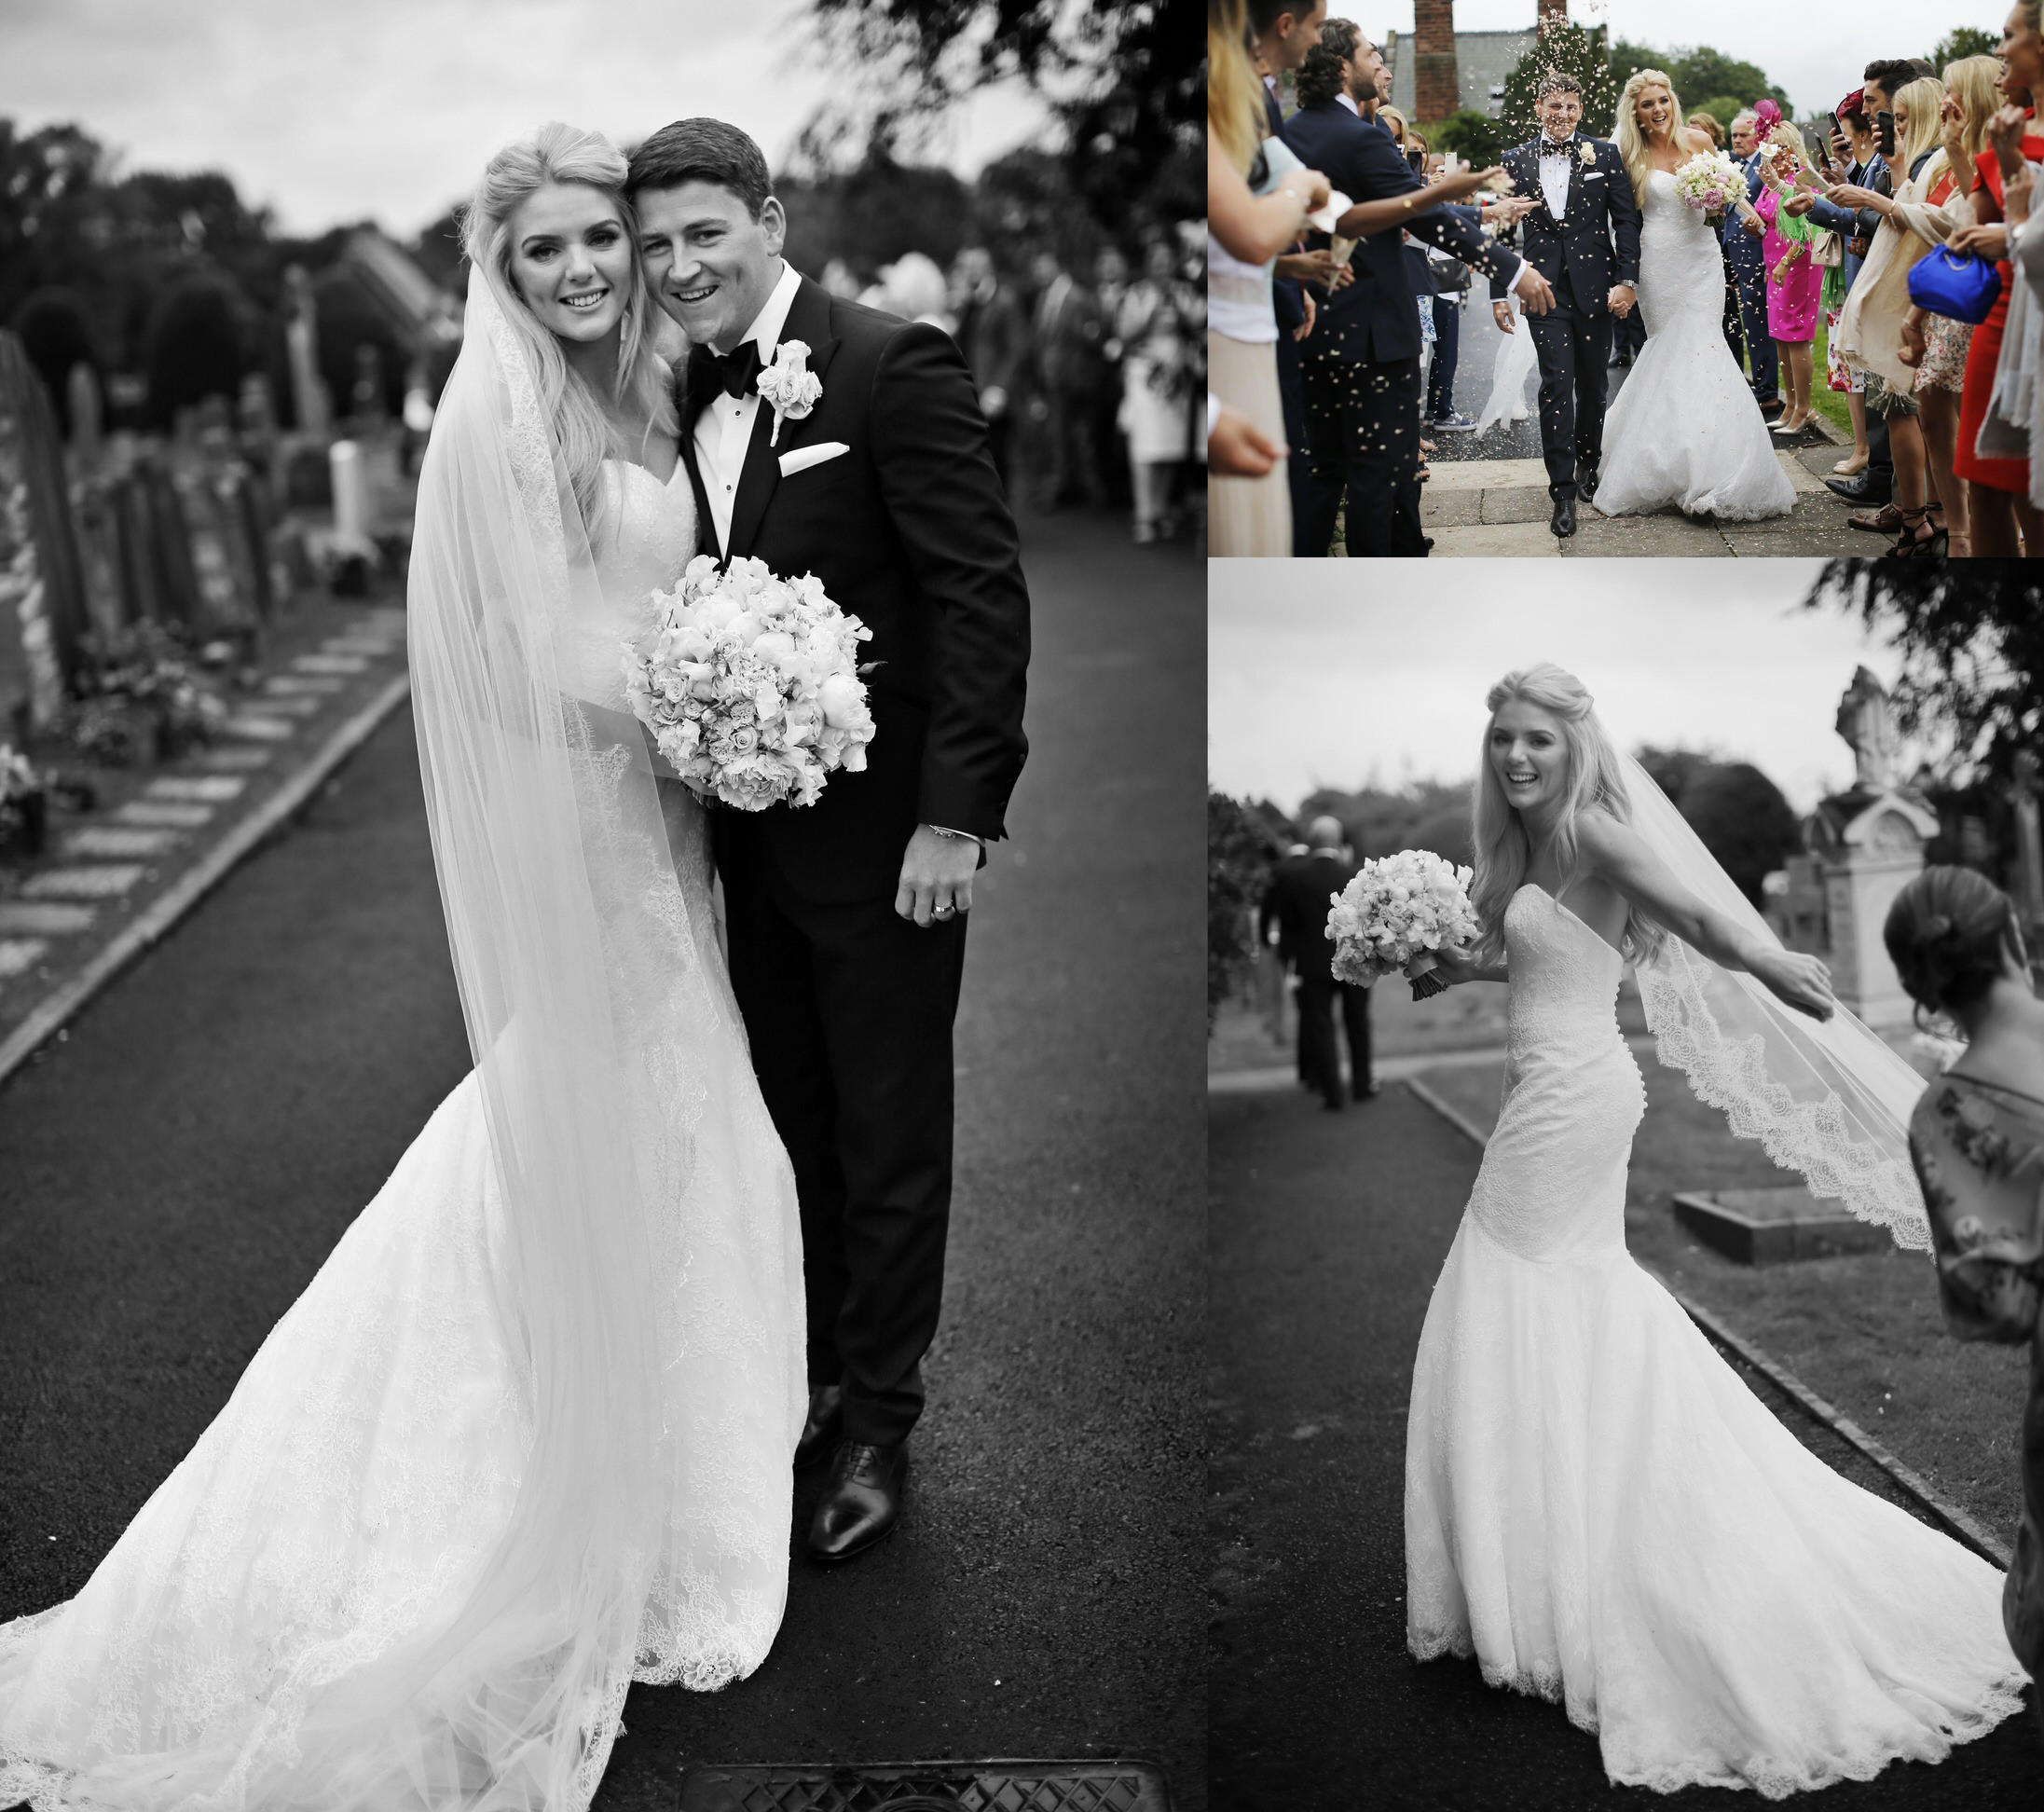 cheshire-wedding-photographer-thornton-manor-weddings_0010.jpg